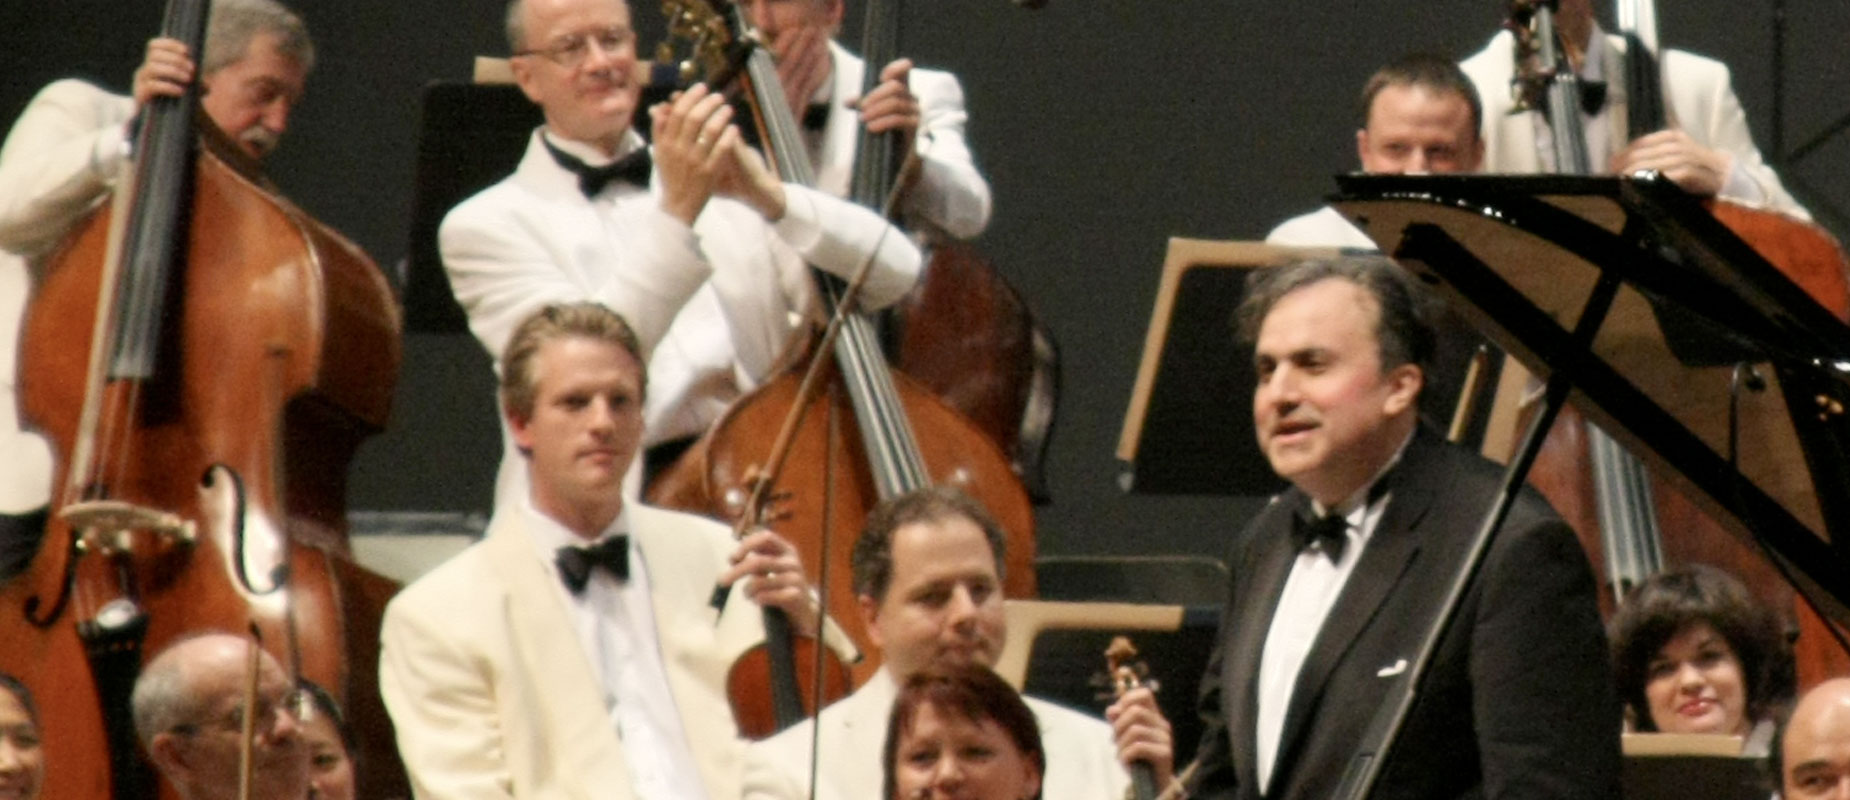 Kripalu Center transportation Tanglewood orchestra members